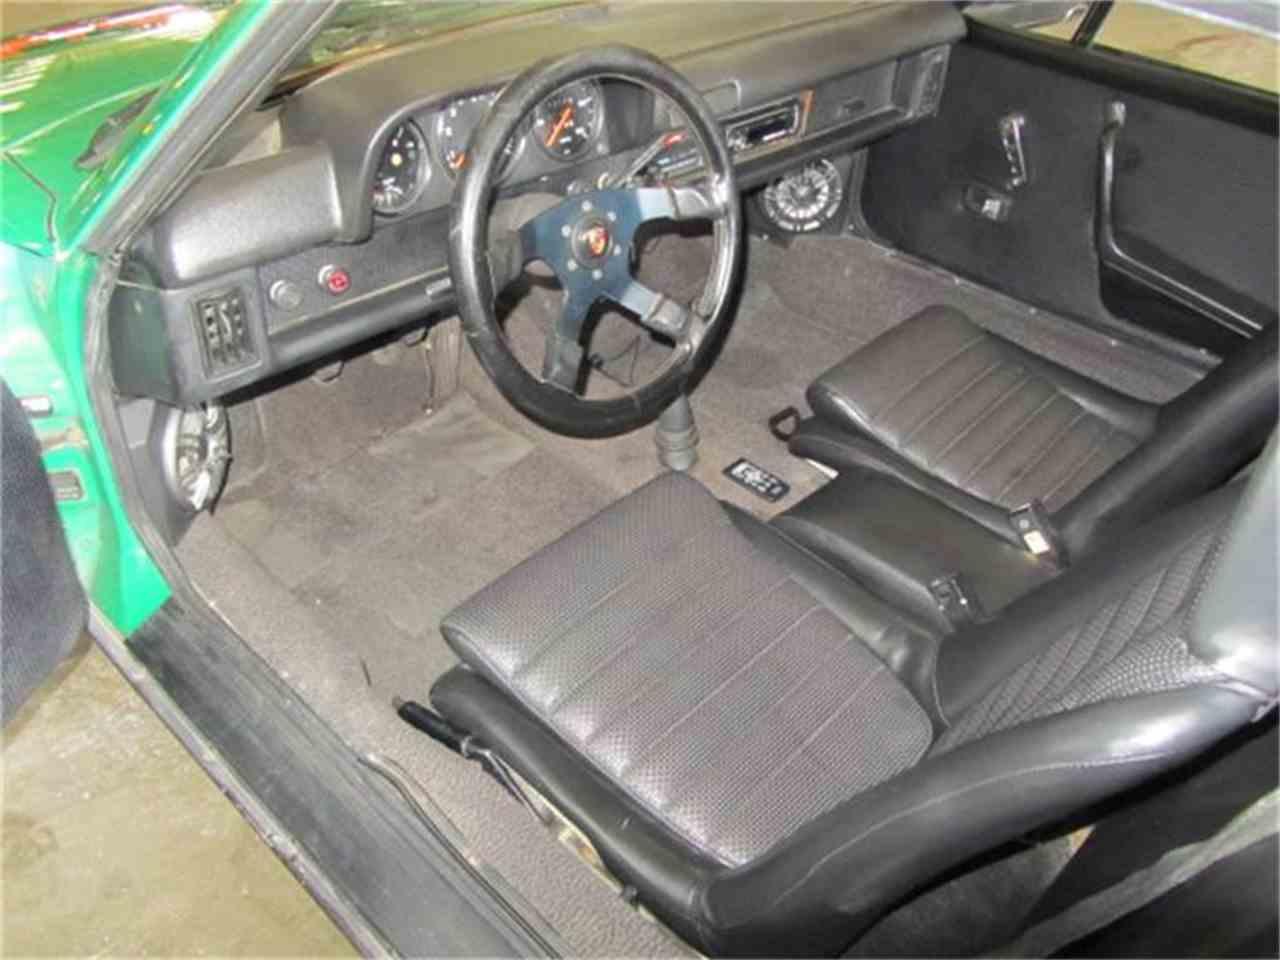 Large Picture of 1975 Porsche 914 located in Omaha Nebraska - $29,900.00 - EB86